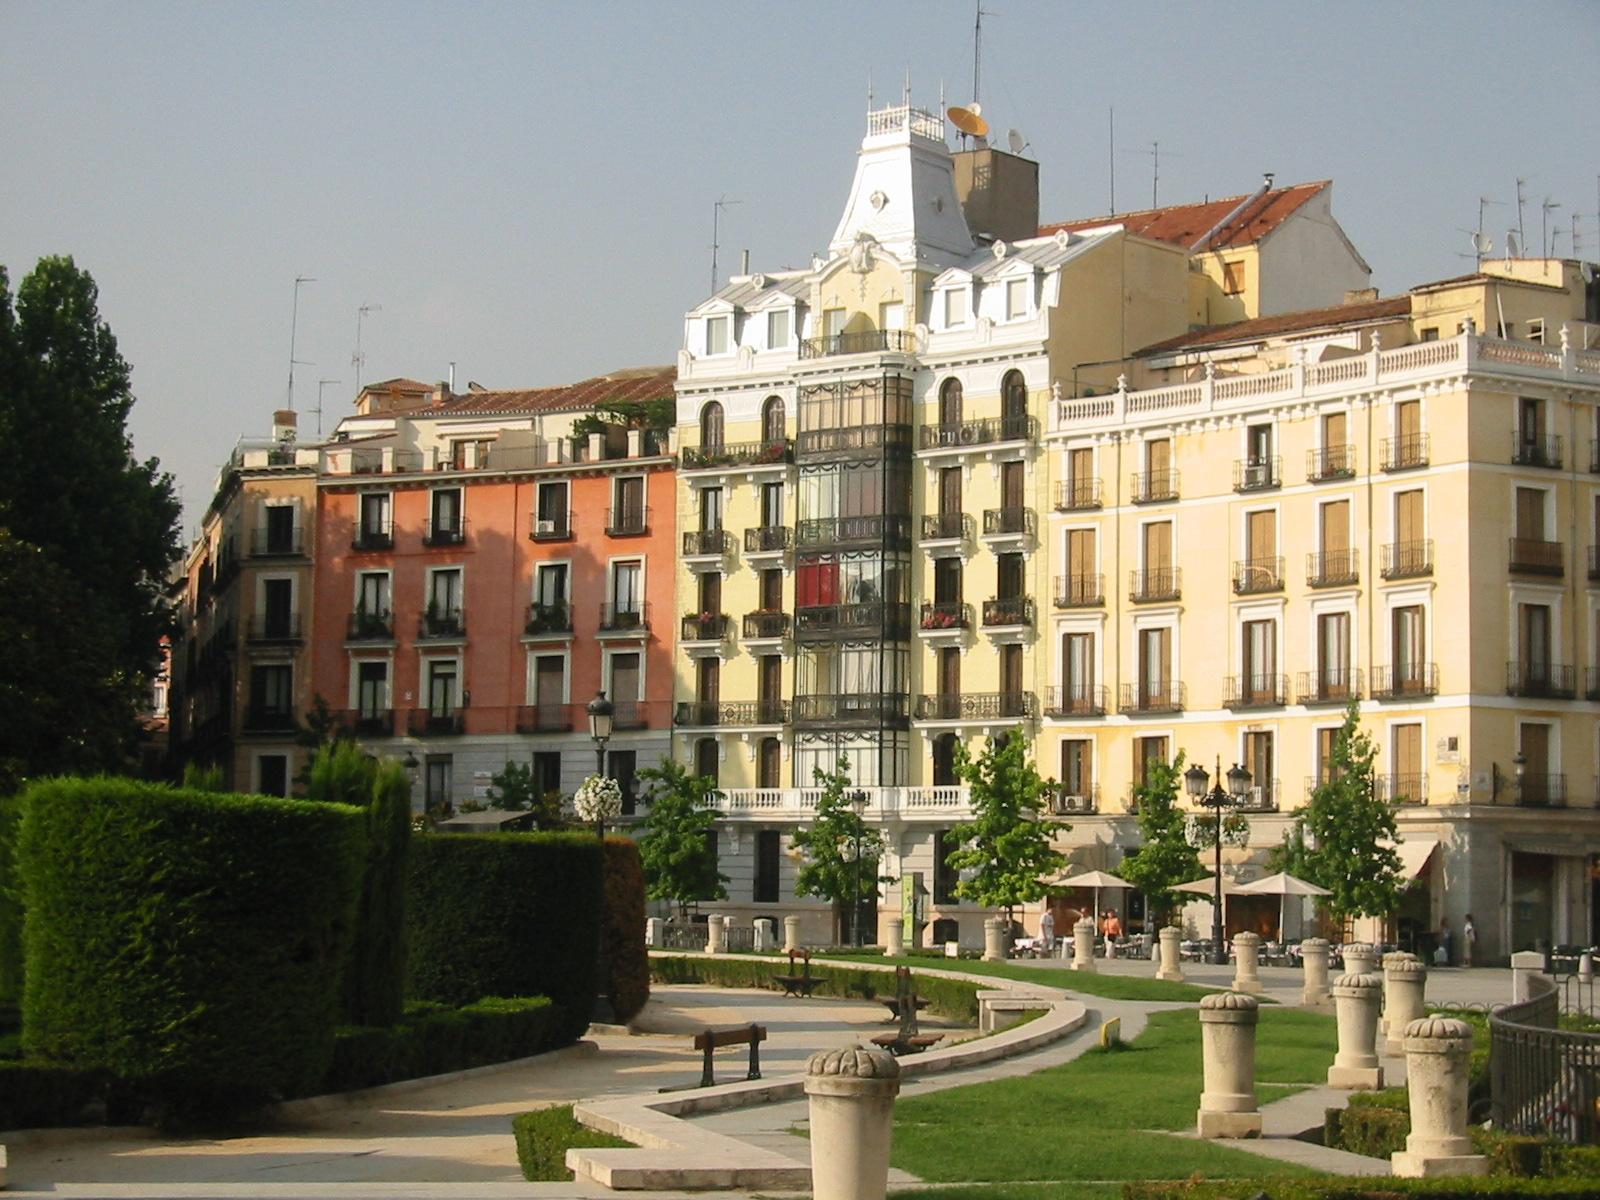 michiel de boer michieldeboer madrid palace palatial gardens hotel grand balconies